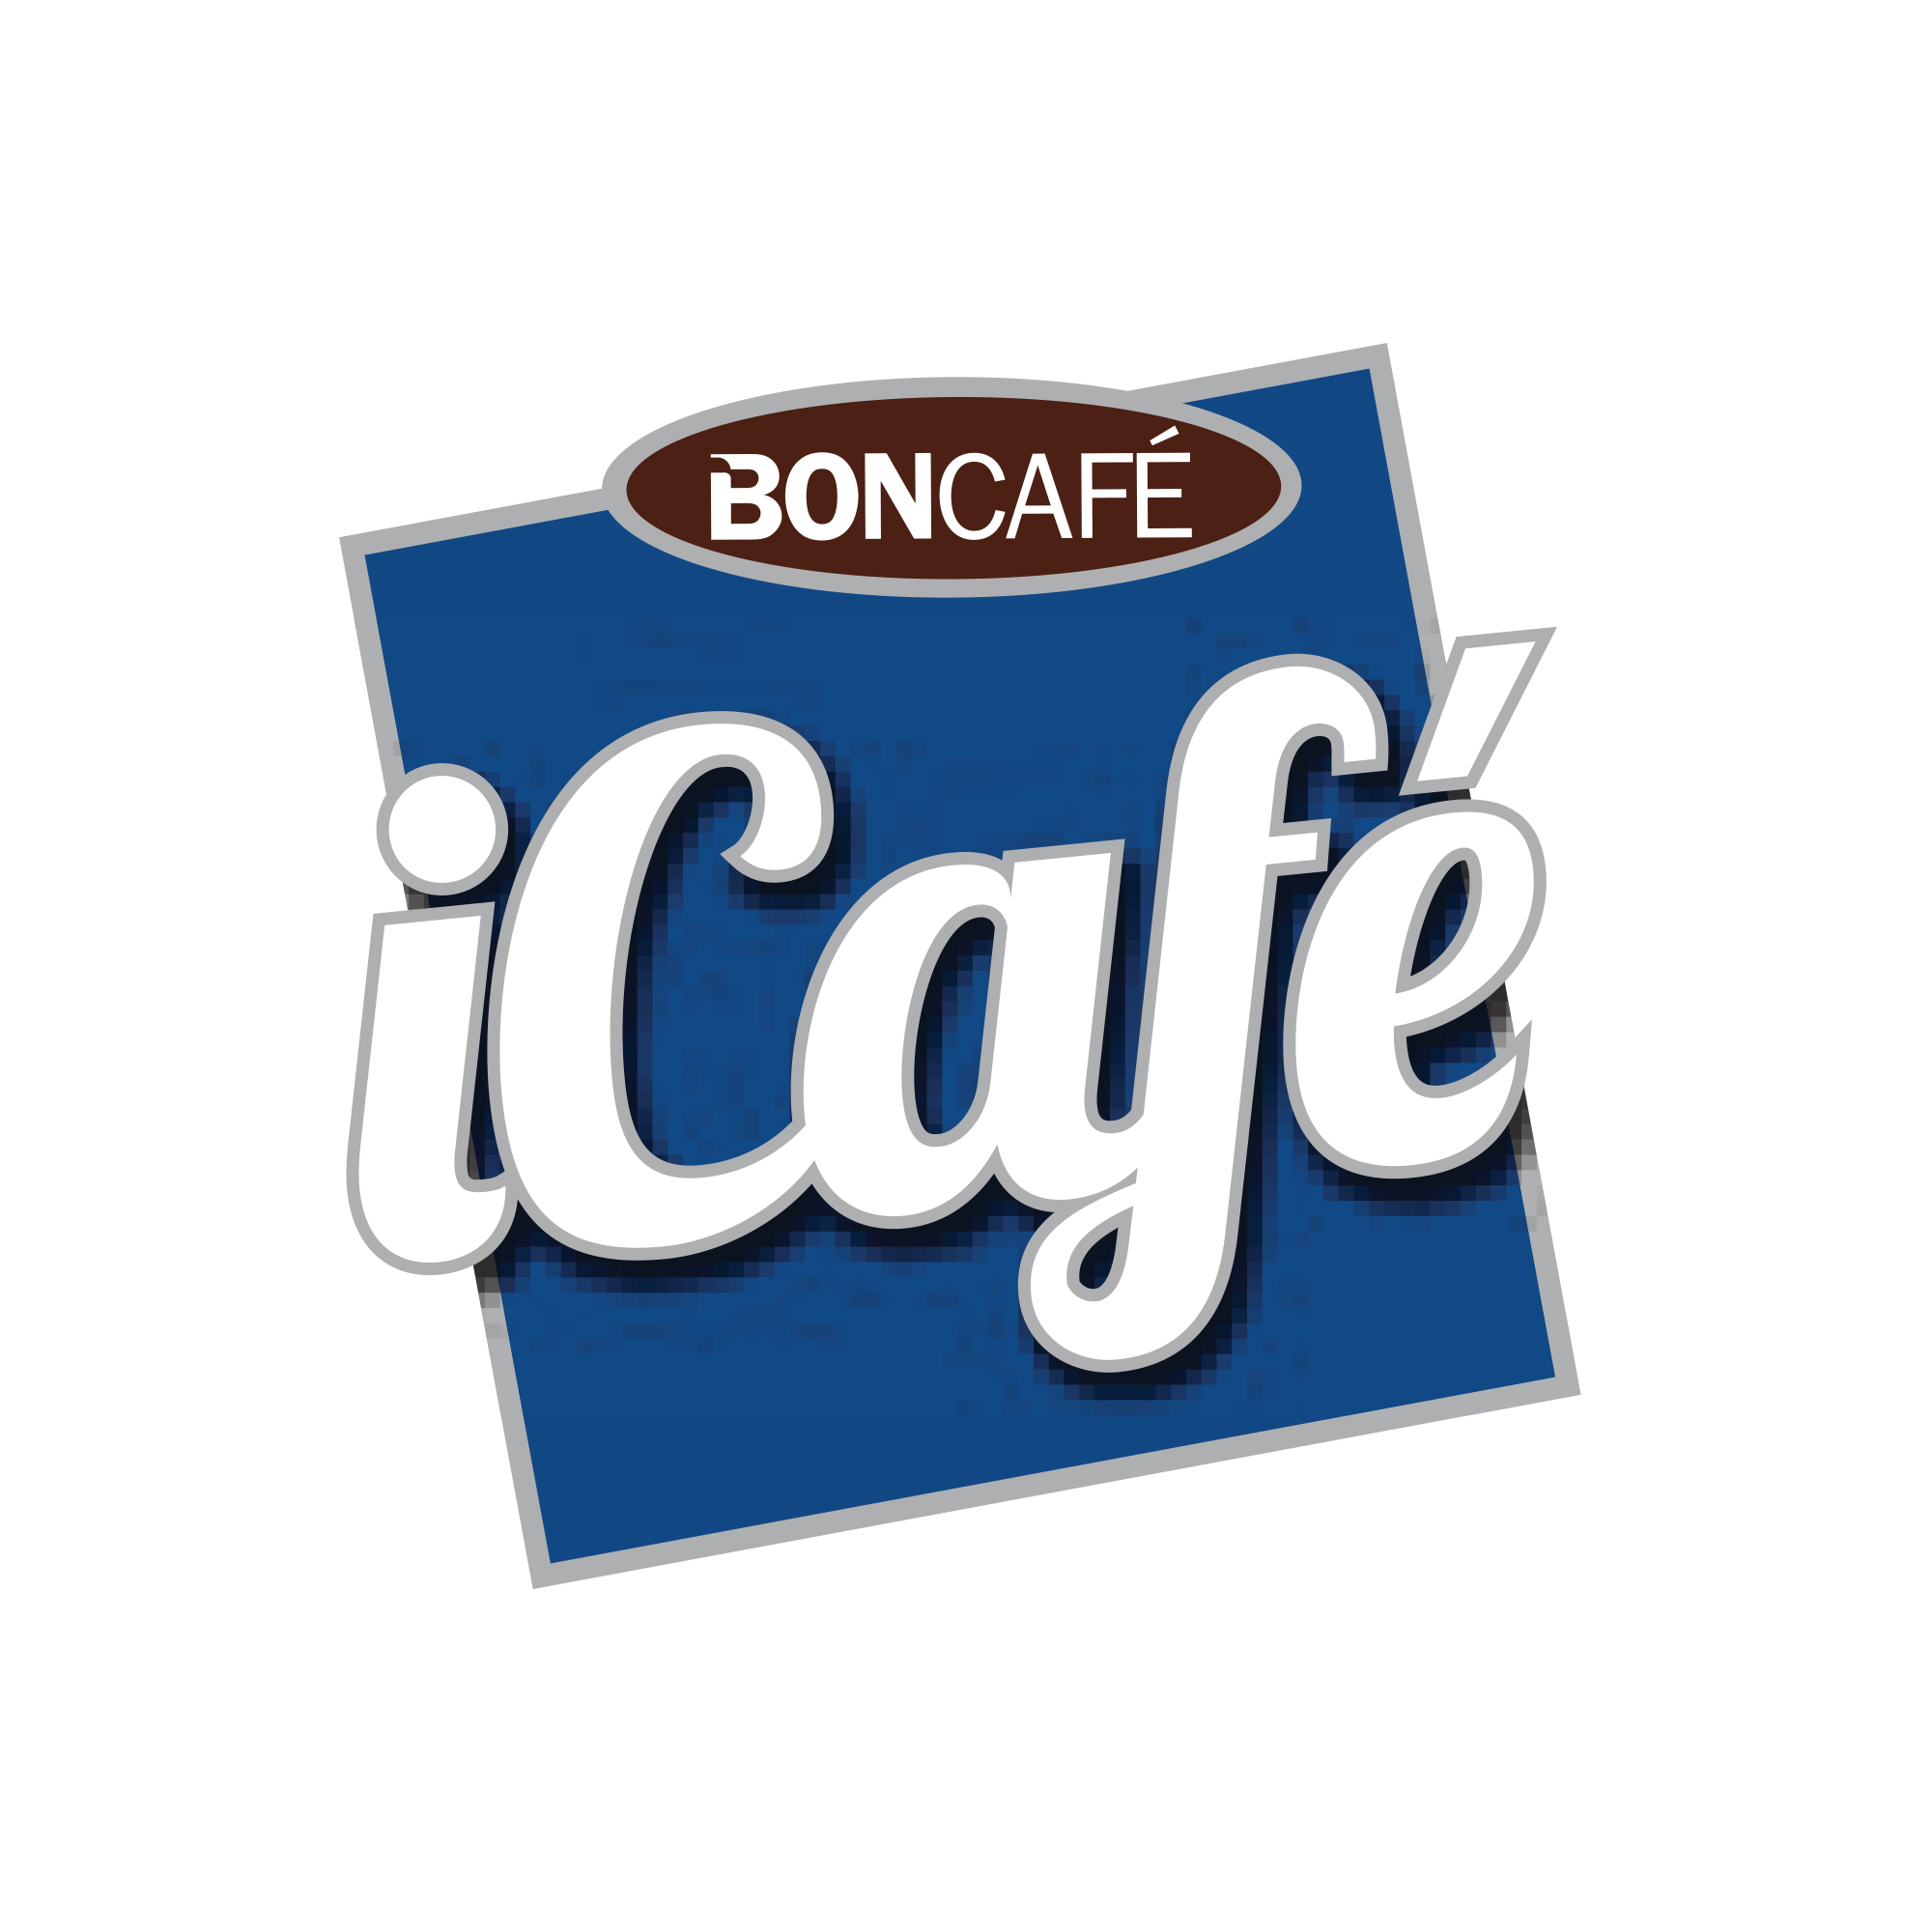 iCafe2.jpg